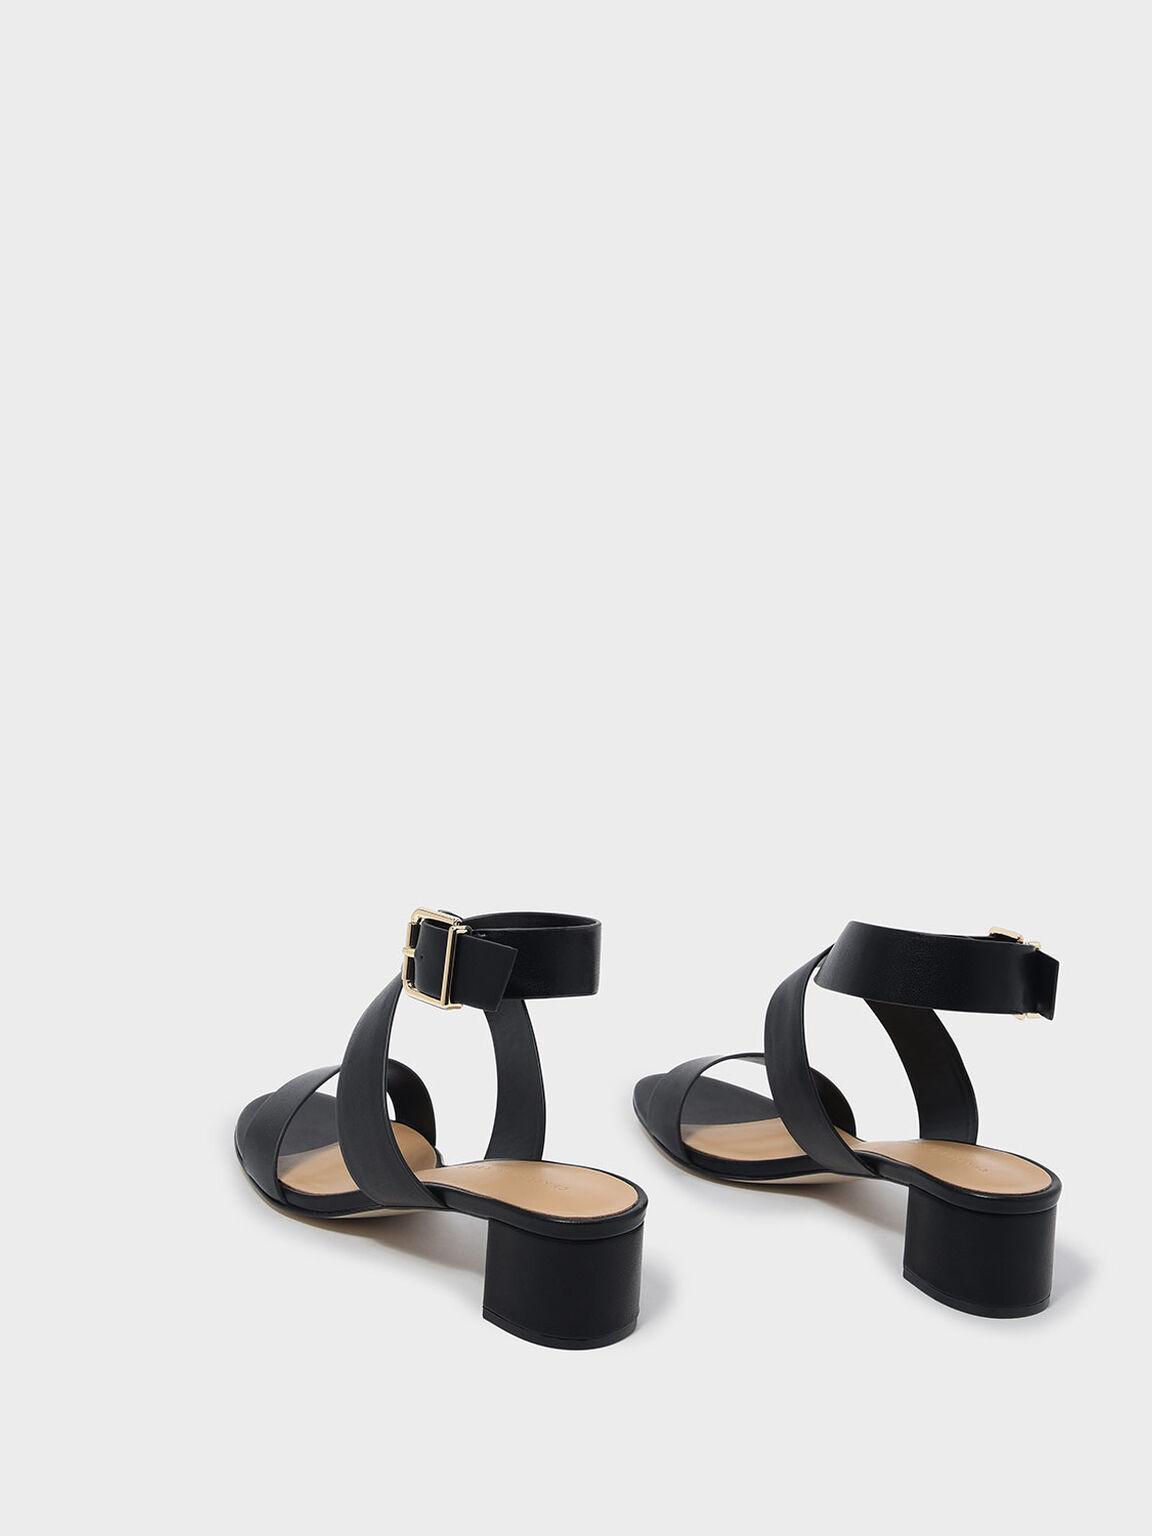 Criss Cross Thick Strap Heeled Sandals, Black, hi-res